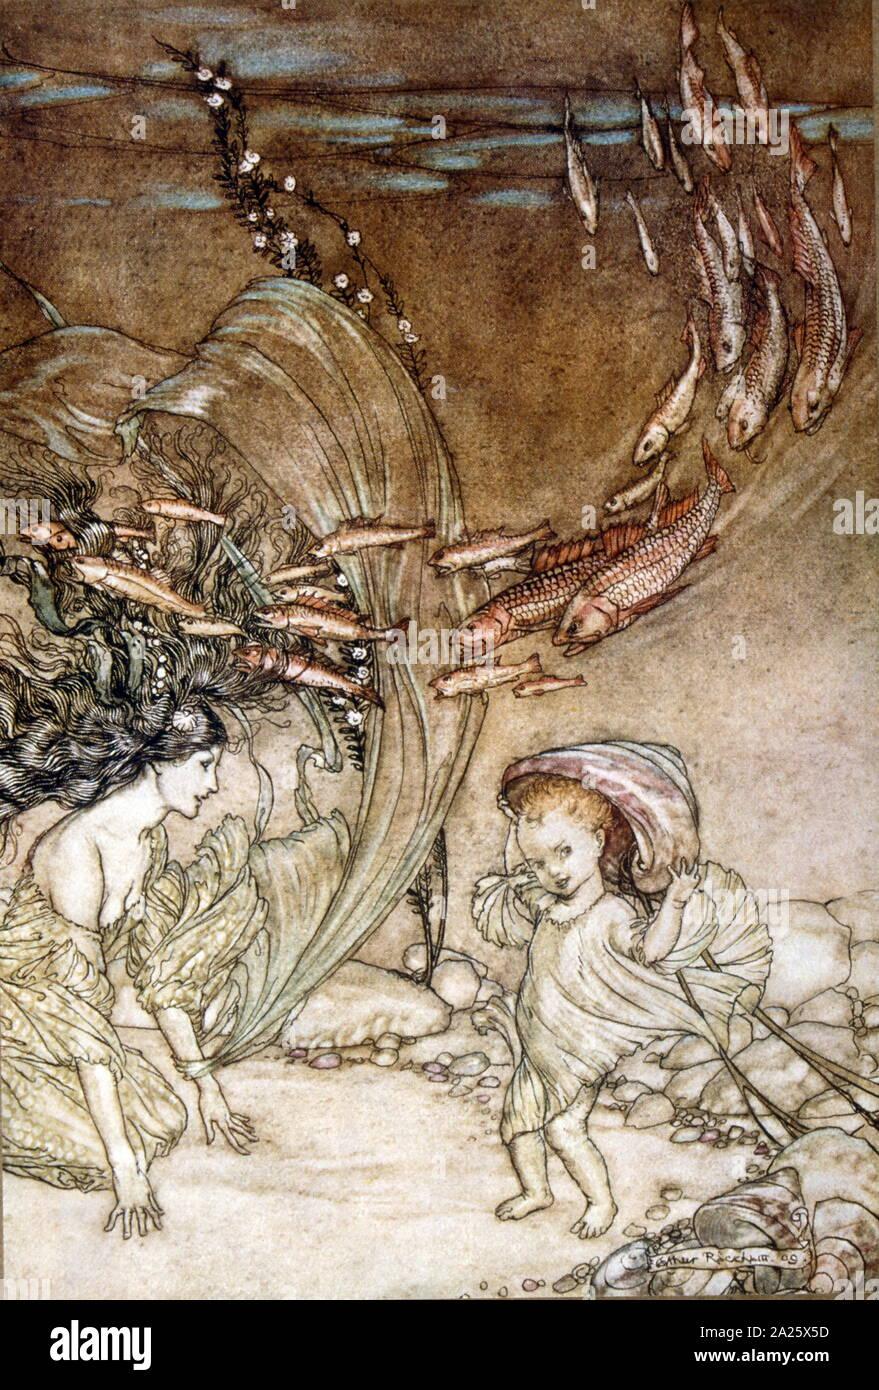 Illustration by Arthur Rackham 1910 depicting, Ondine (Undine), a fairy-tale novella by Friedrich de la Motte Fouque; in which Undine, a water spirit, marries a knight named Huldebrand in order to gain a soul. It is an early German romance Stock Photo